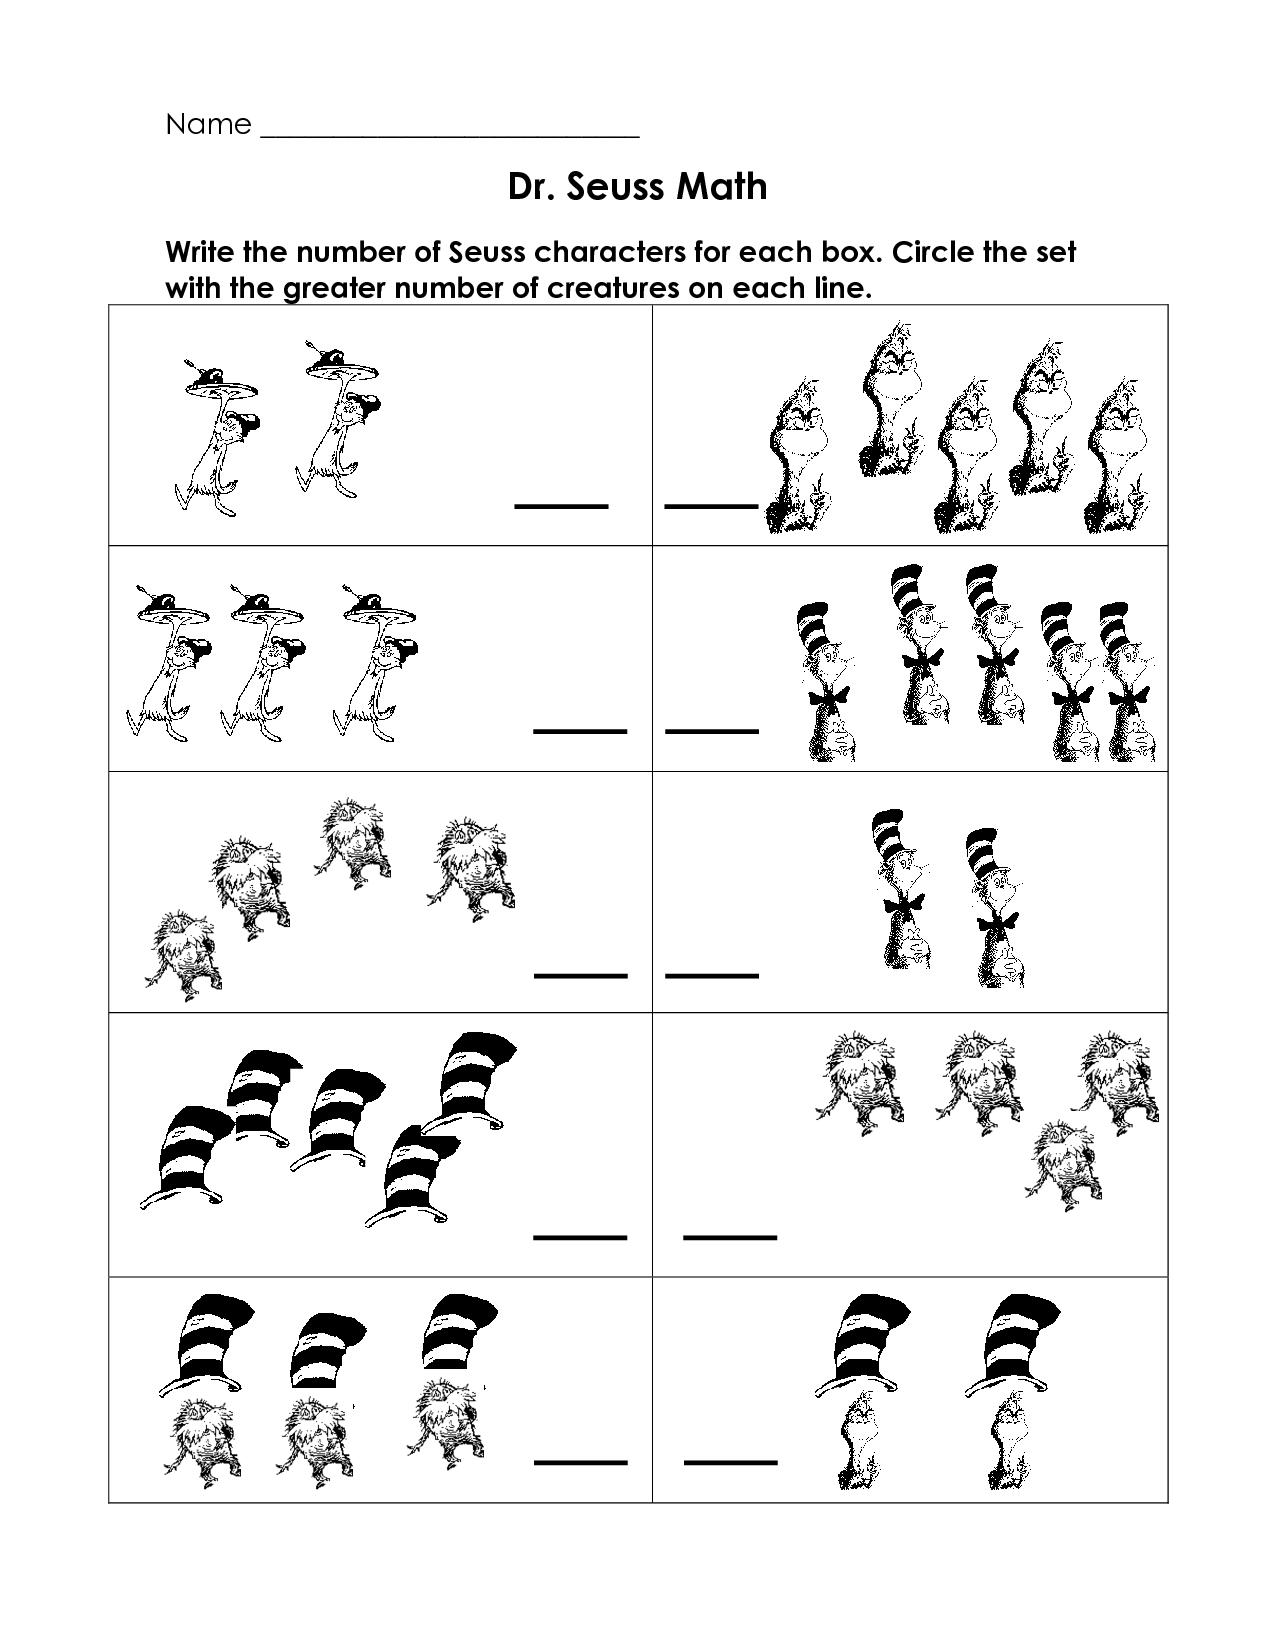 Dr Seuss Free Printable Worksheet For Preschool